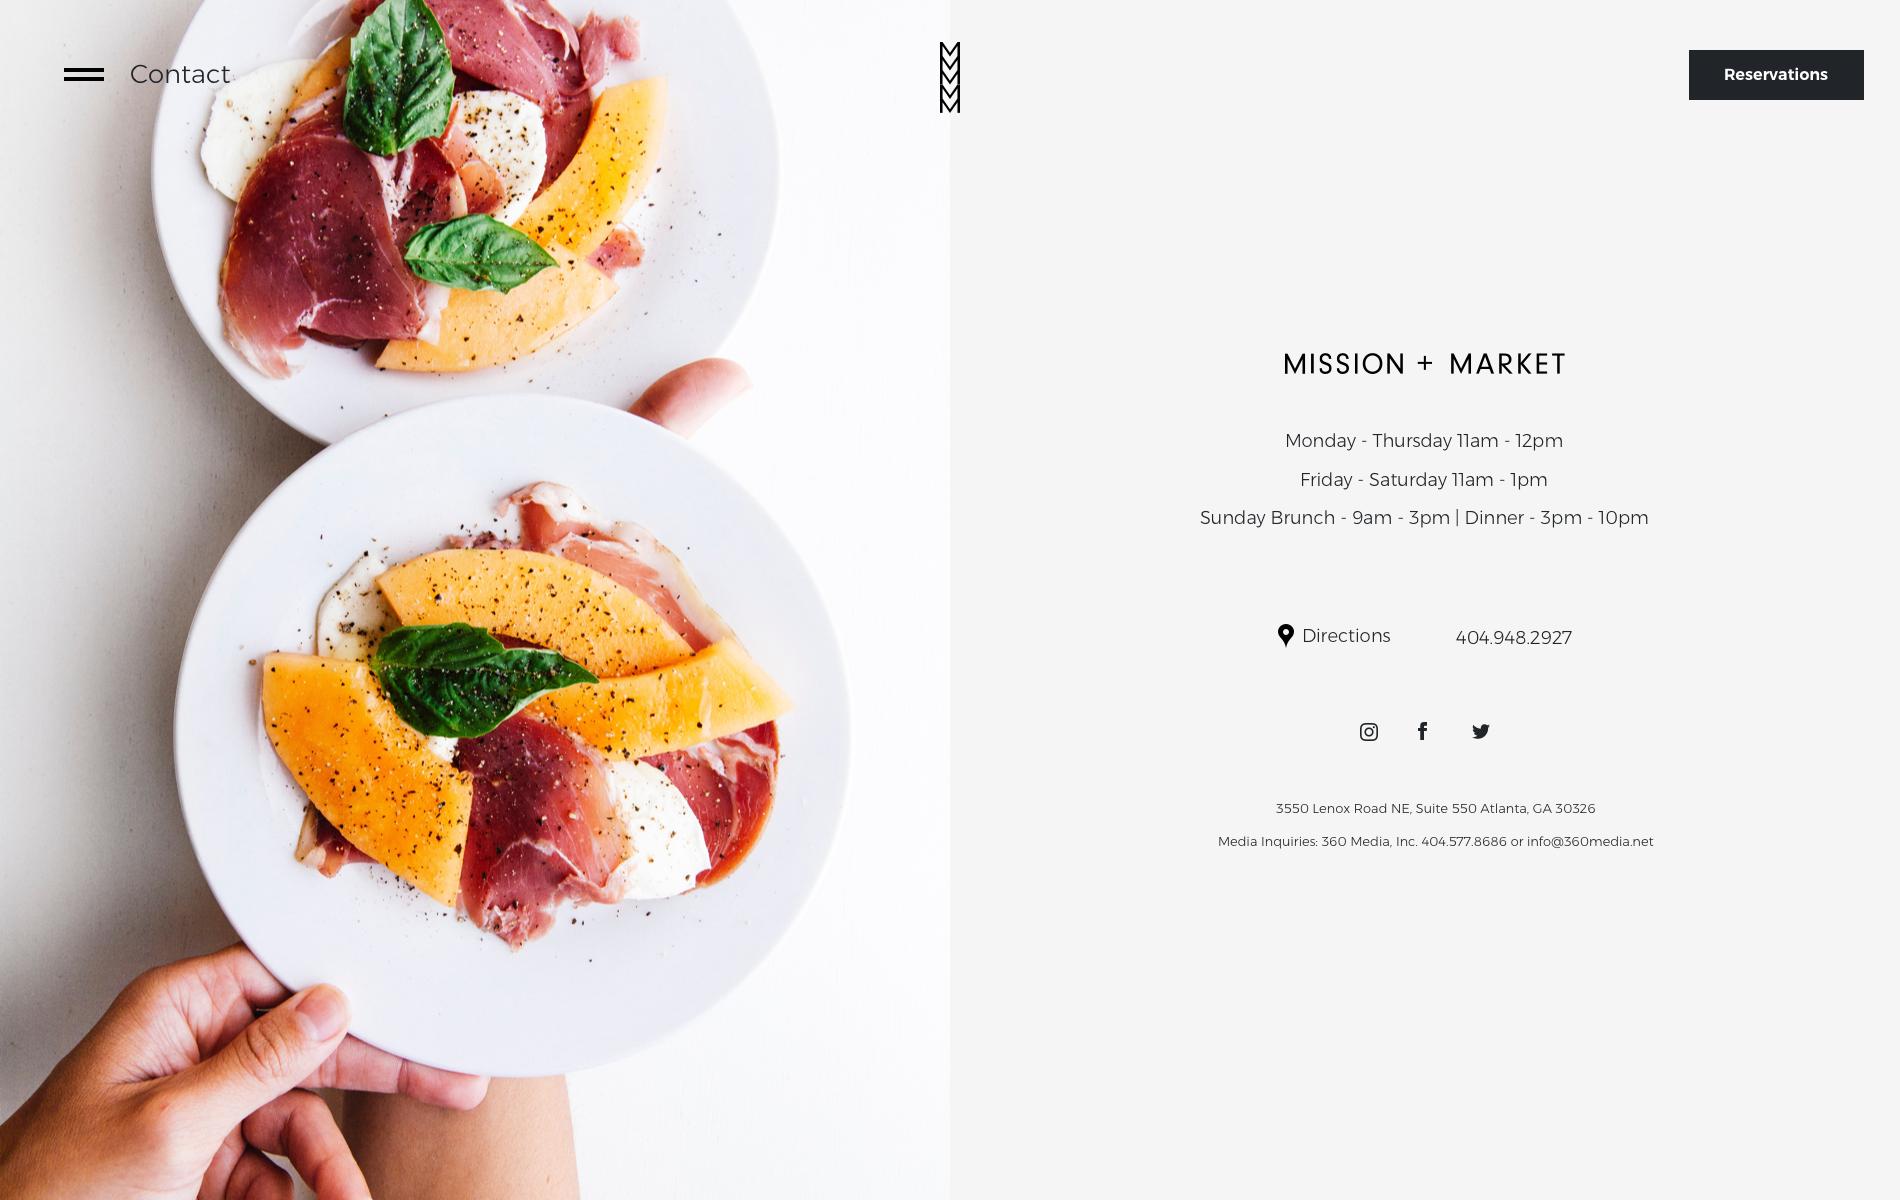 Responsive Restaurant Website Design in Atlanta